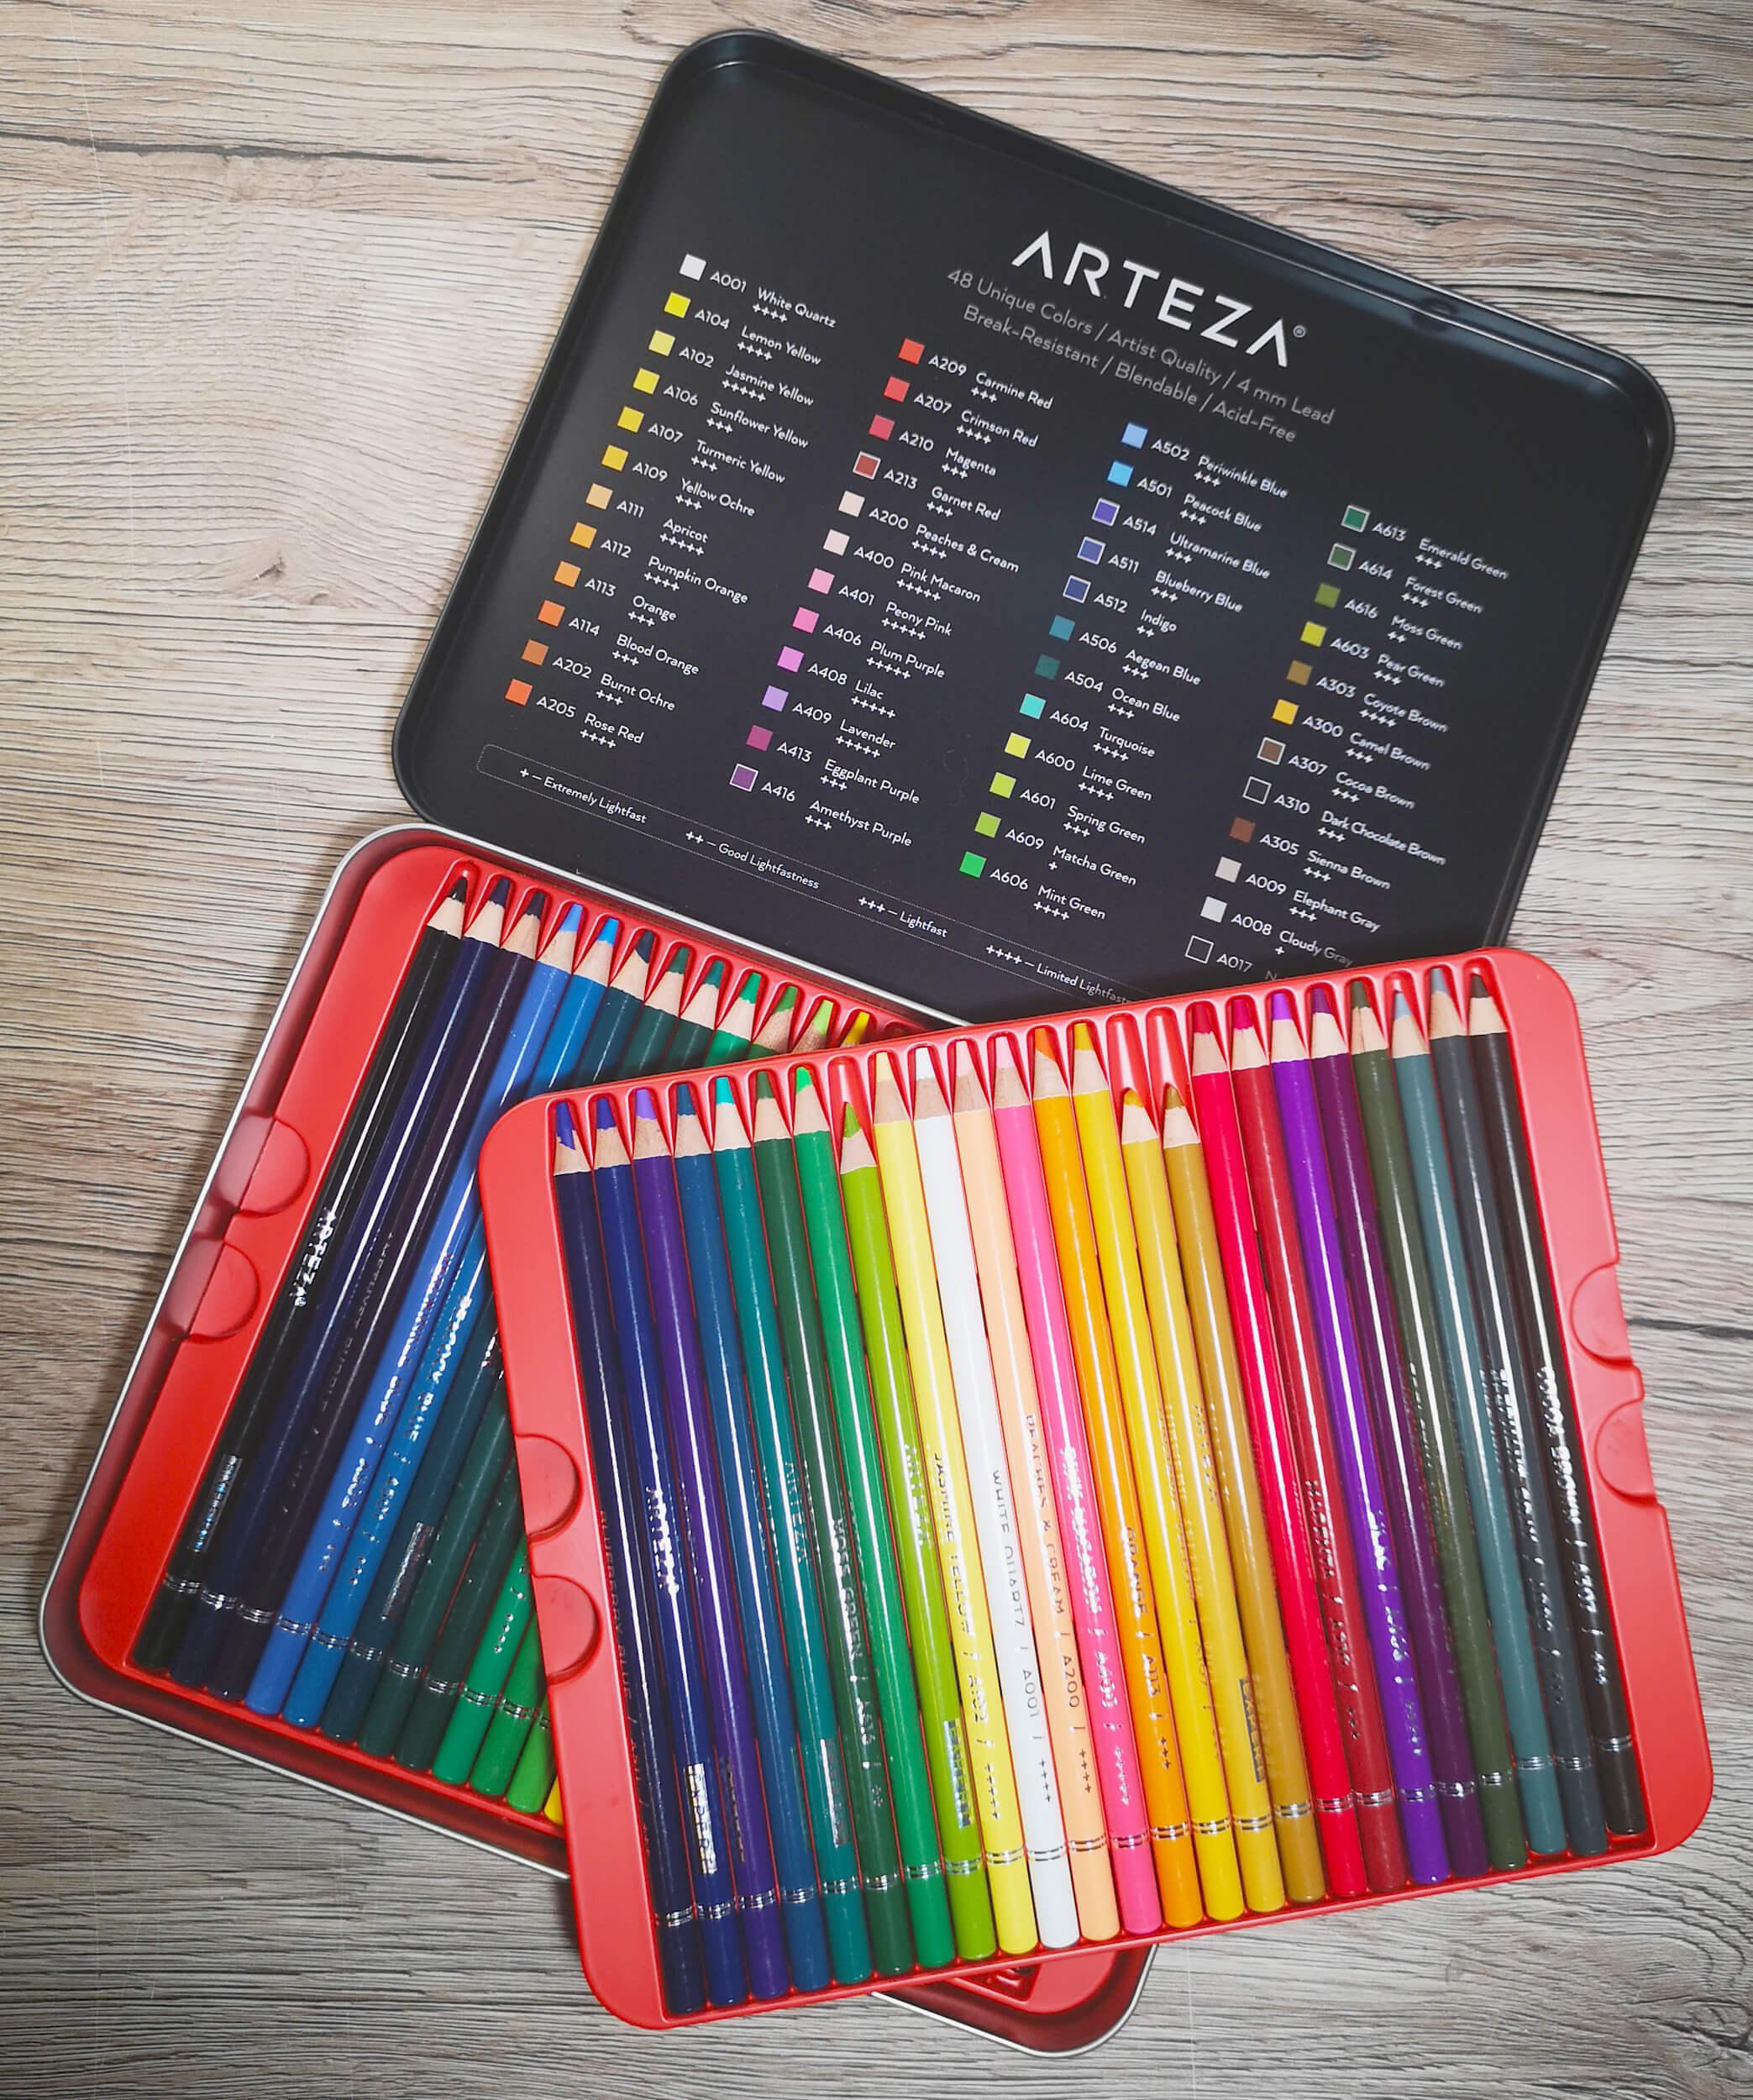 Review: Arteza Expert Colored Pencils